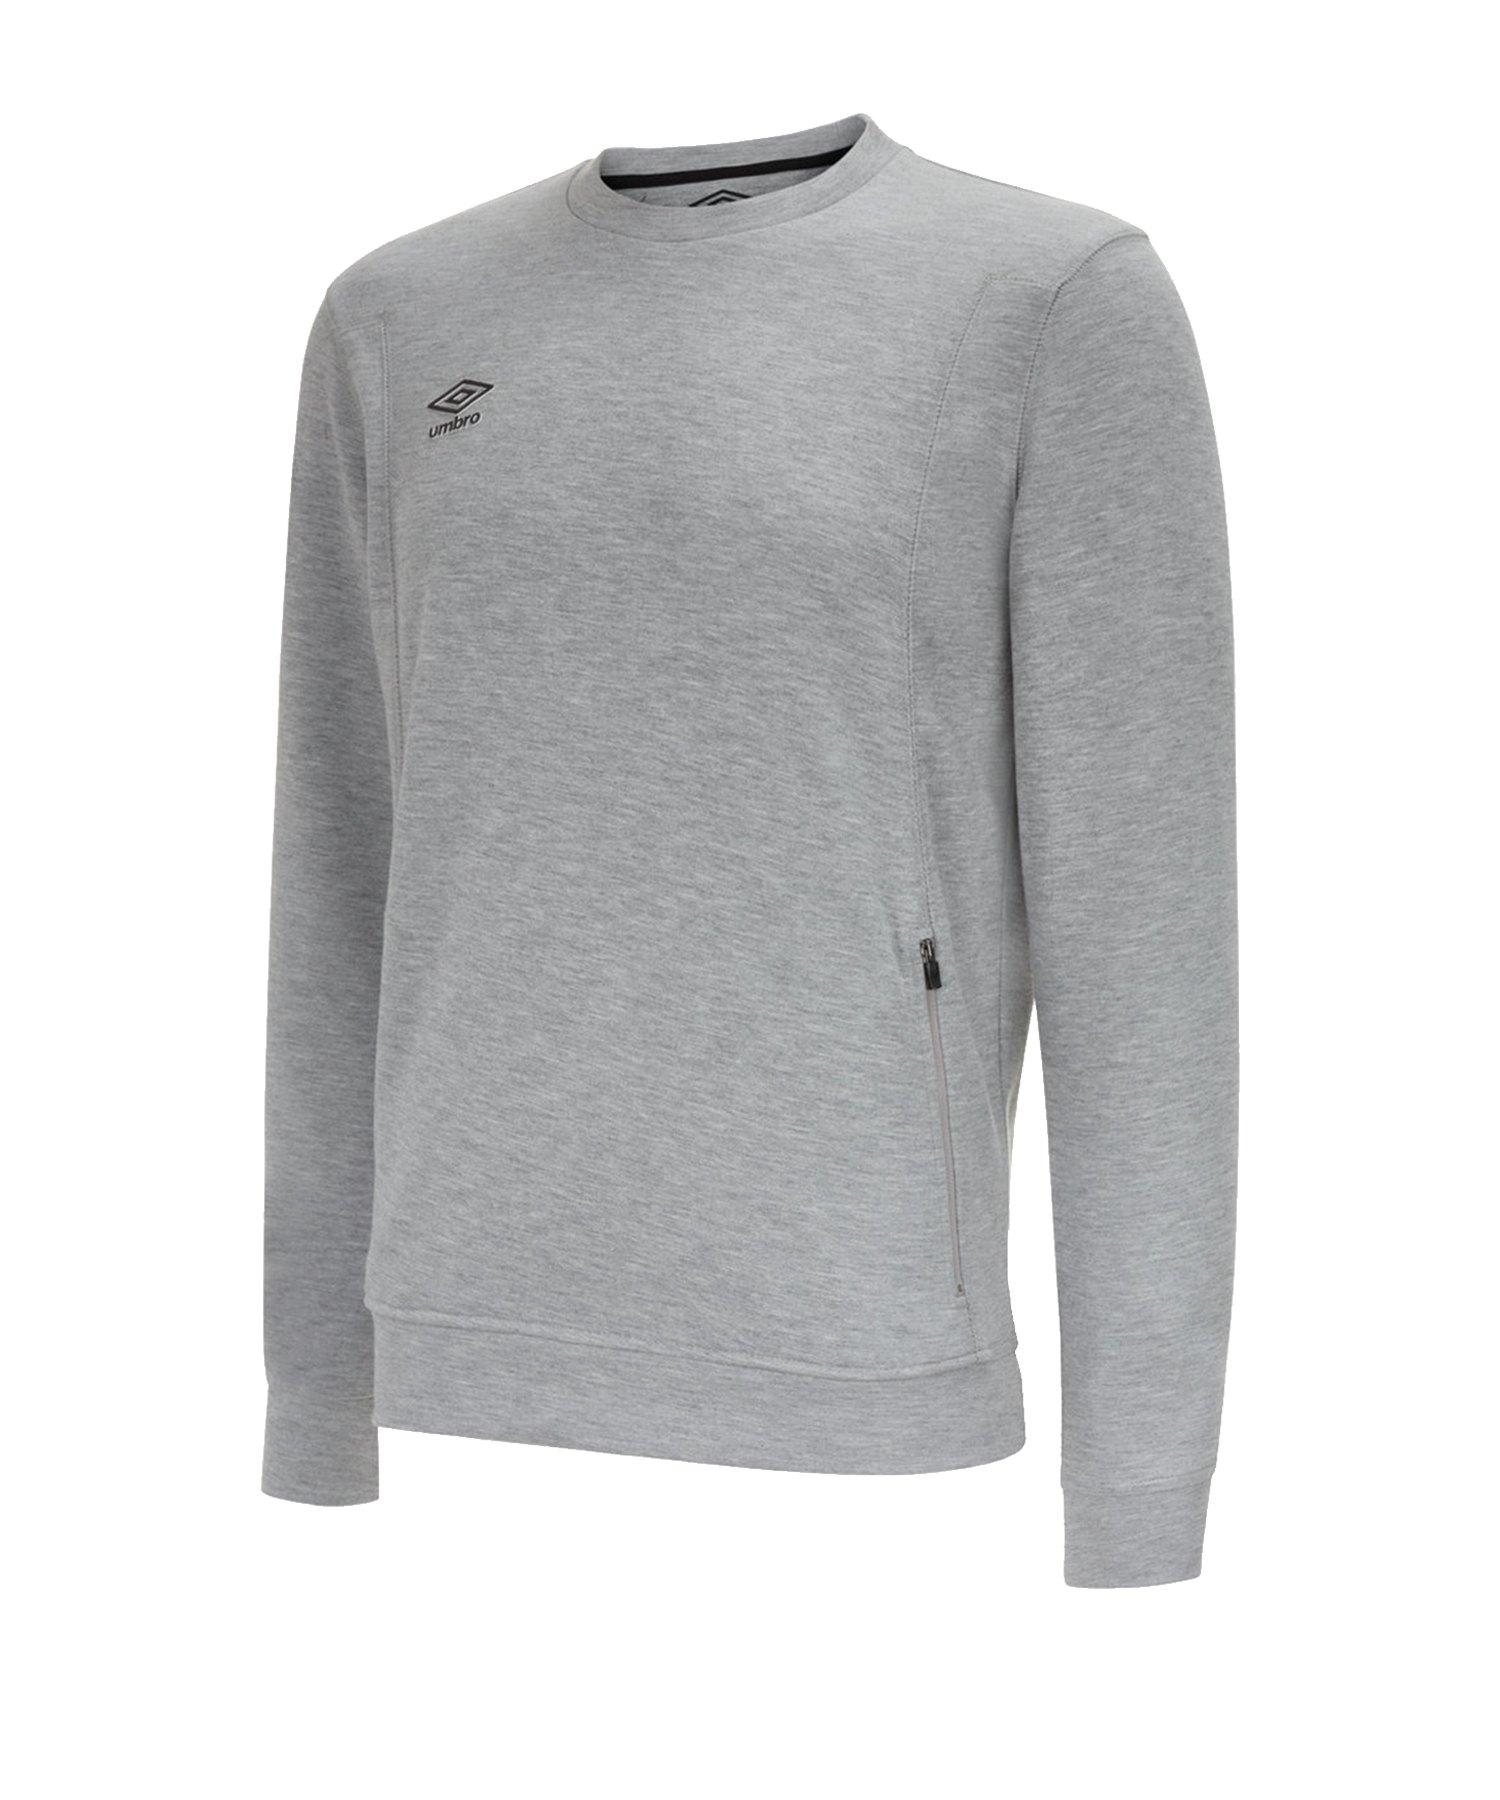 Umbro Pro Fleece Sweatshirt Grau FB43 - Grau